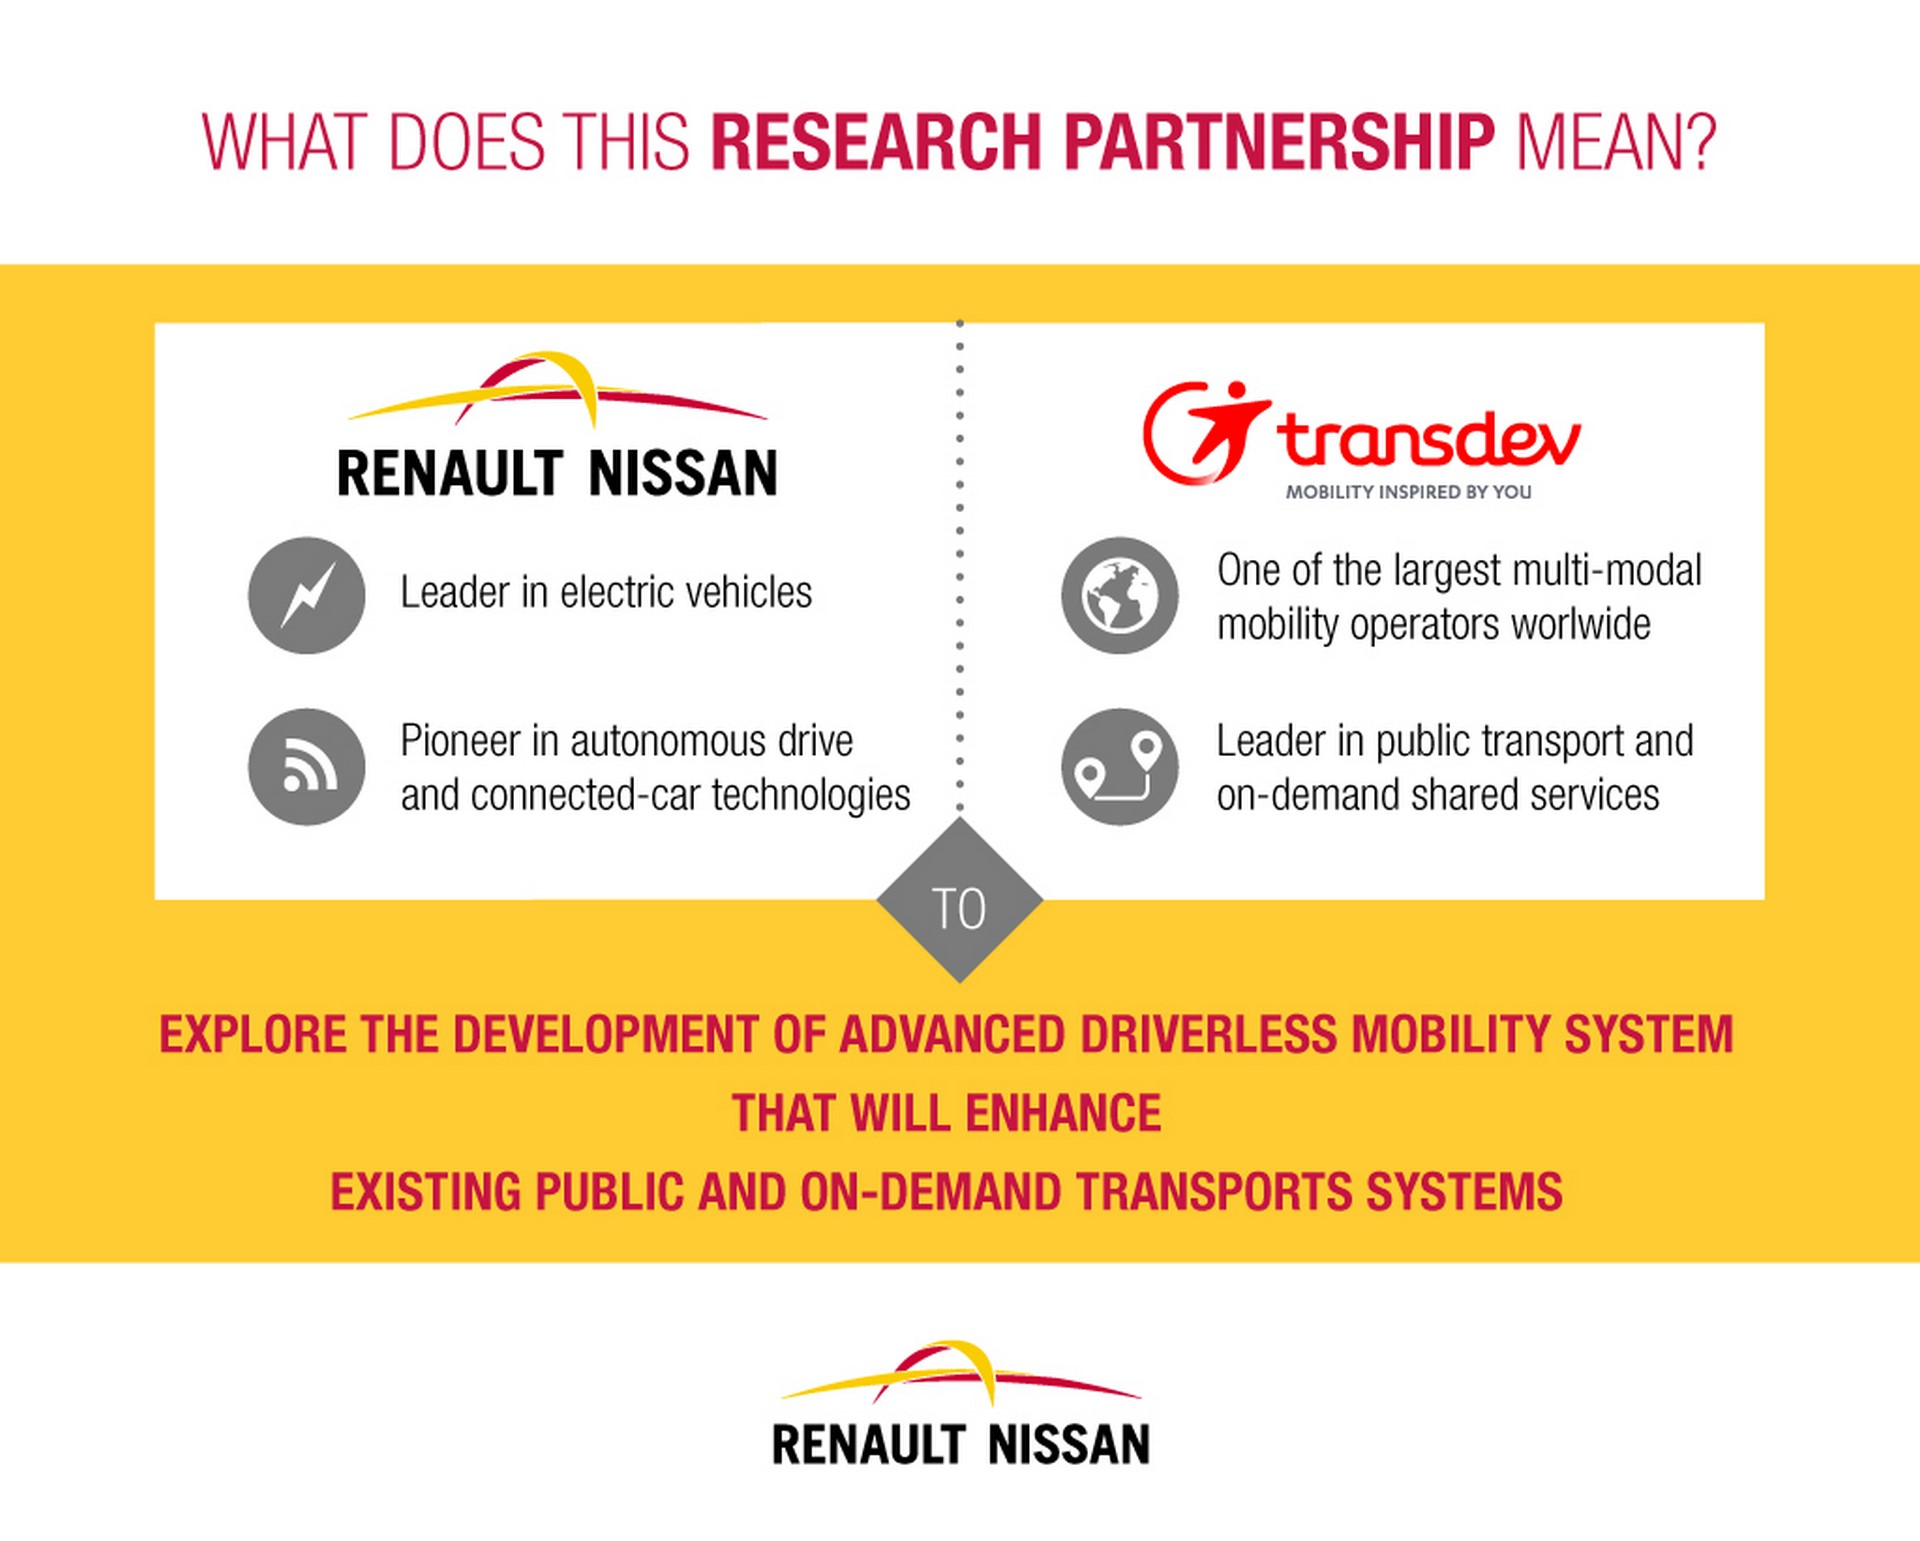 Renault Nissan Alliance Transdev partnership 3